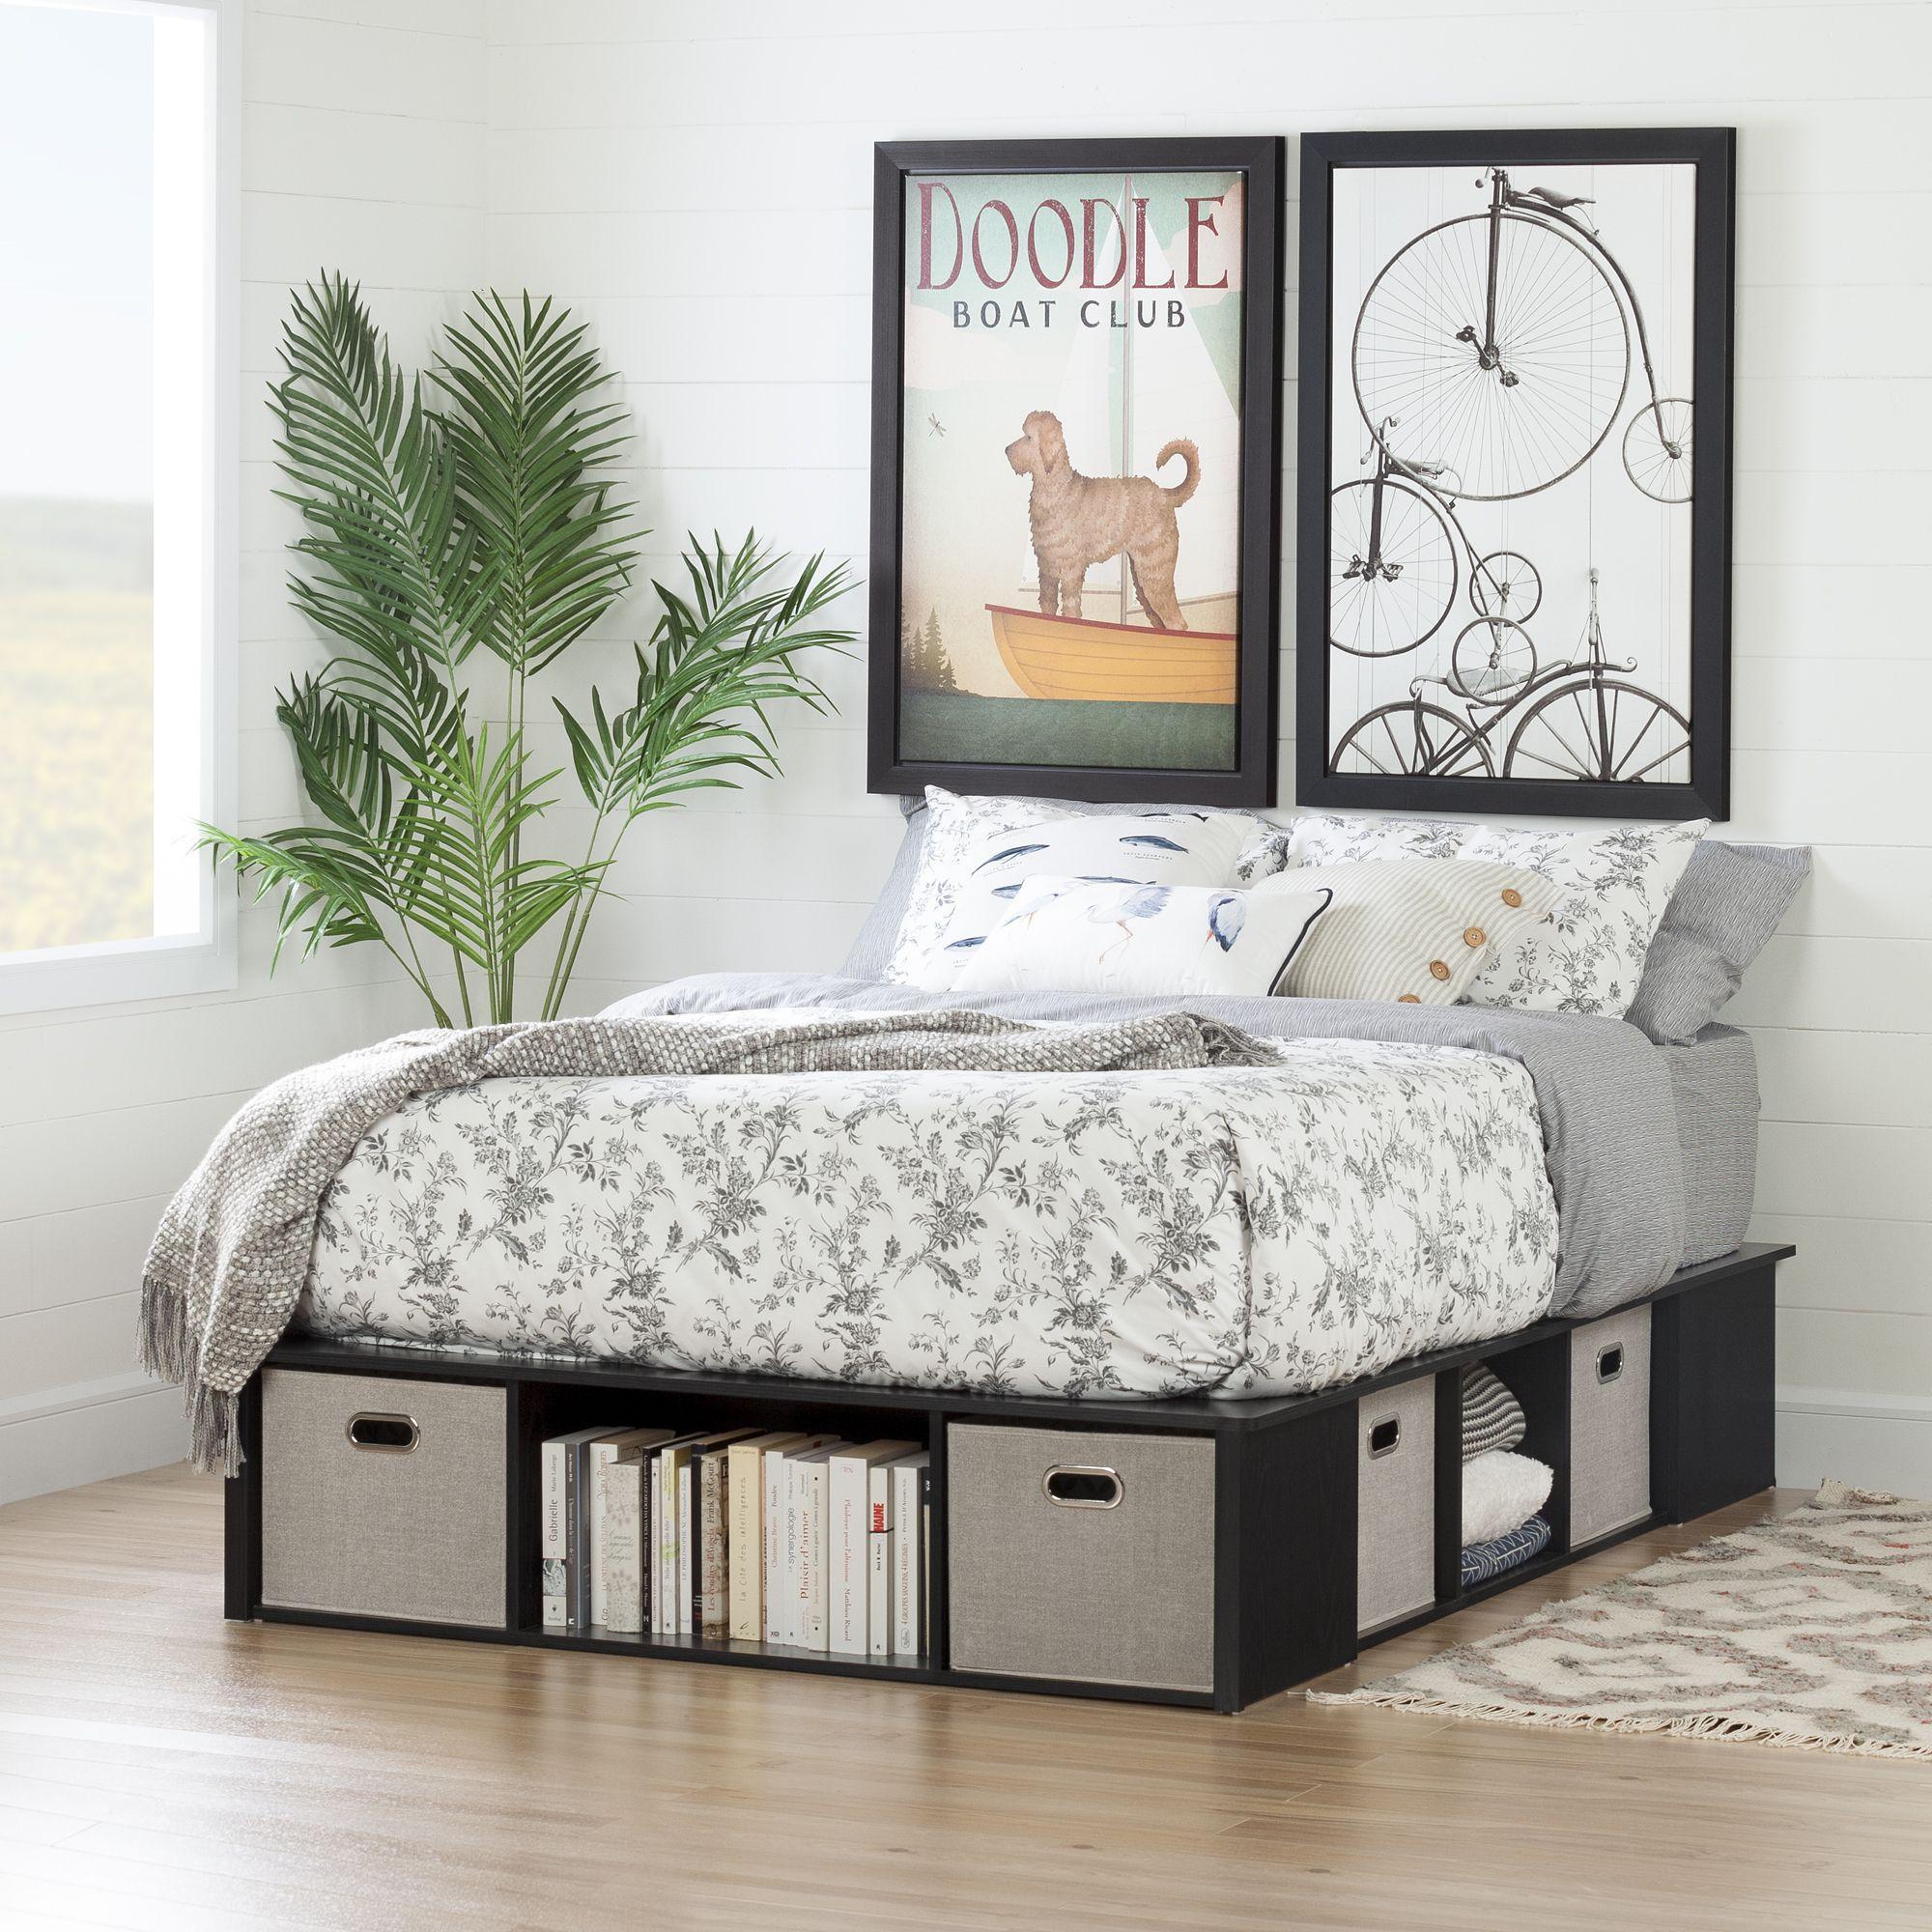 Leather Bed Oak Beds Und: South Shore Flexible Black Oak Full-Size Platform Bed With